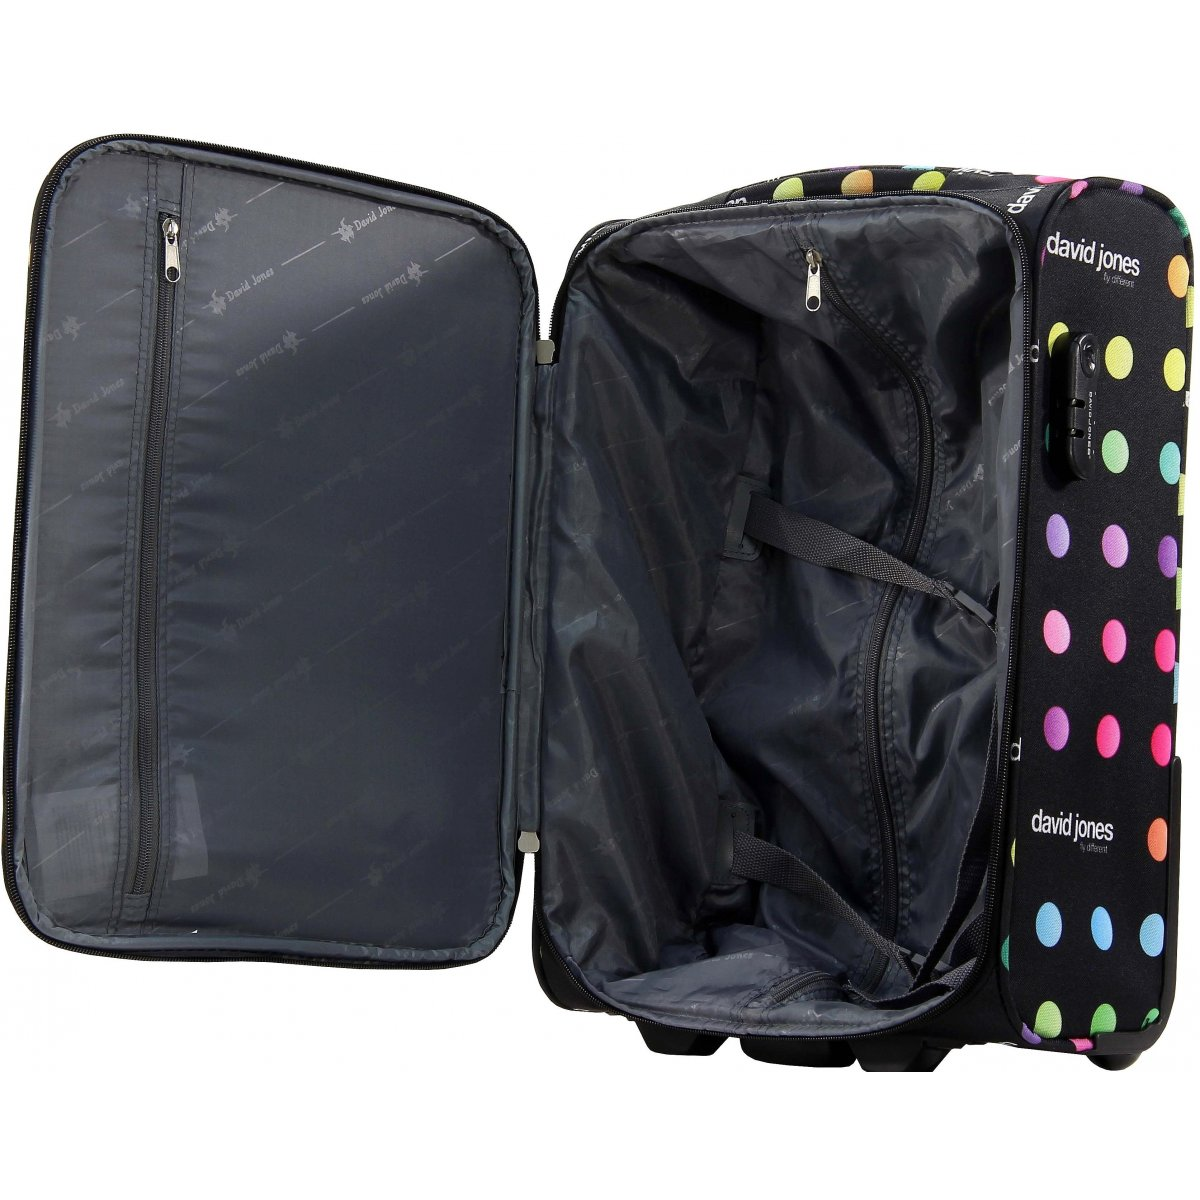 valise cabine ryanair david jones taille 50 cm r20031p couleur principale pois promotion. Black Bedroom Furniture Sets. Home Design Ideas